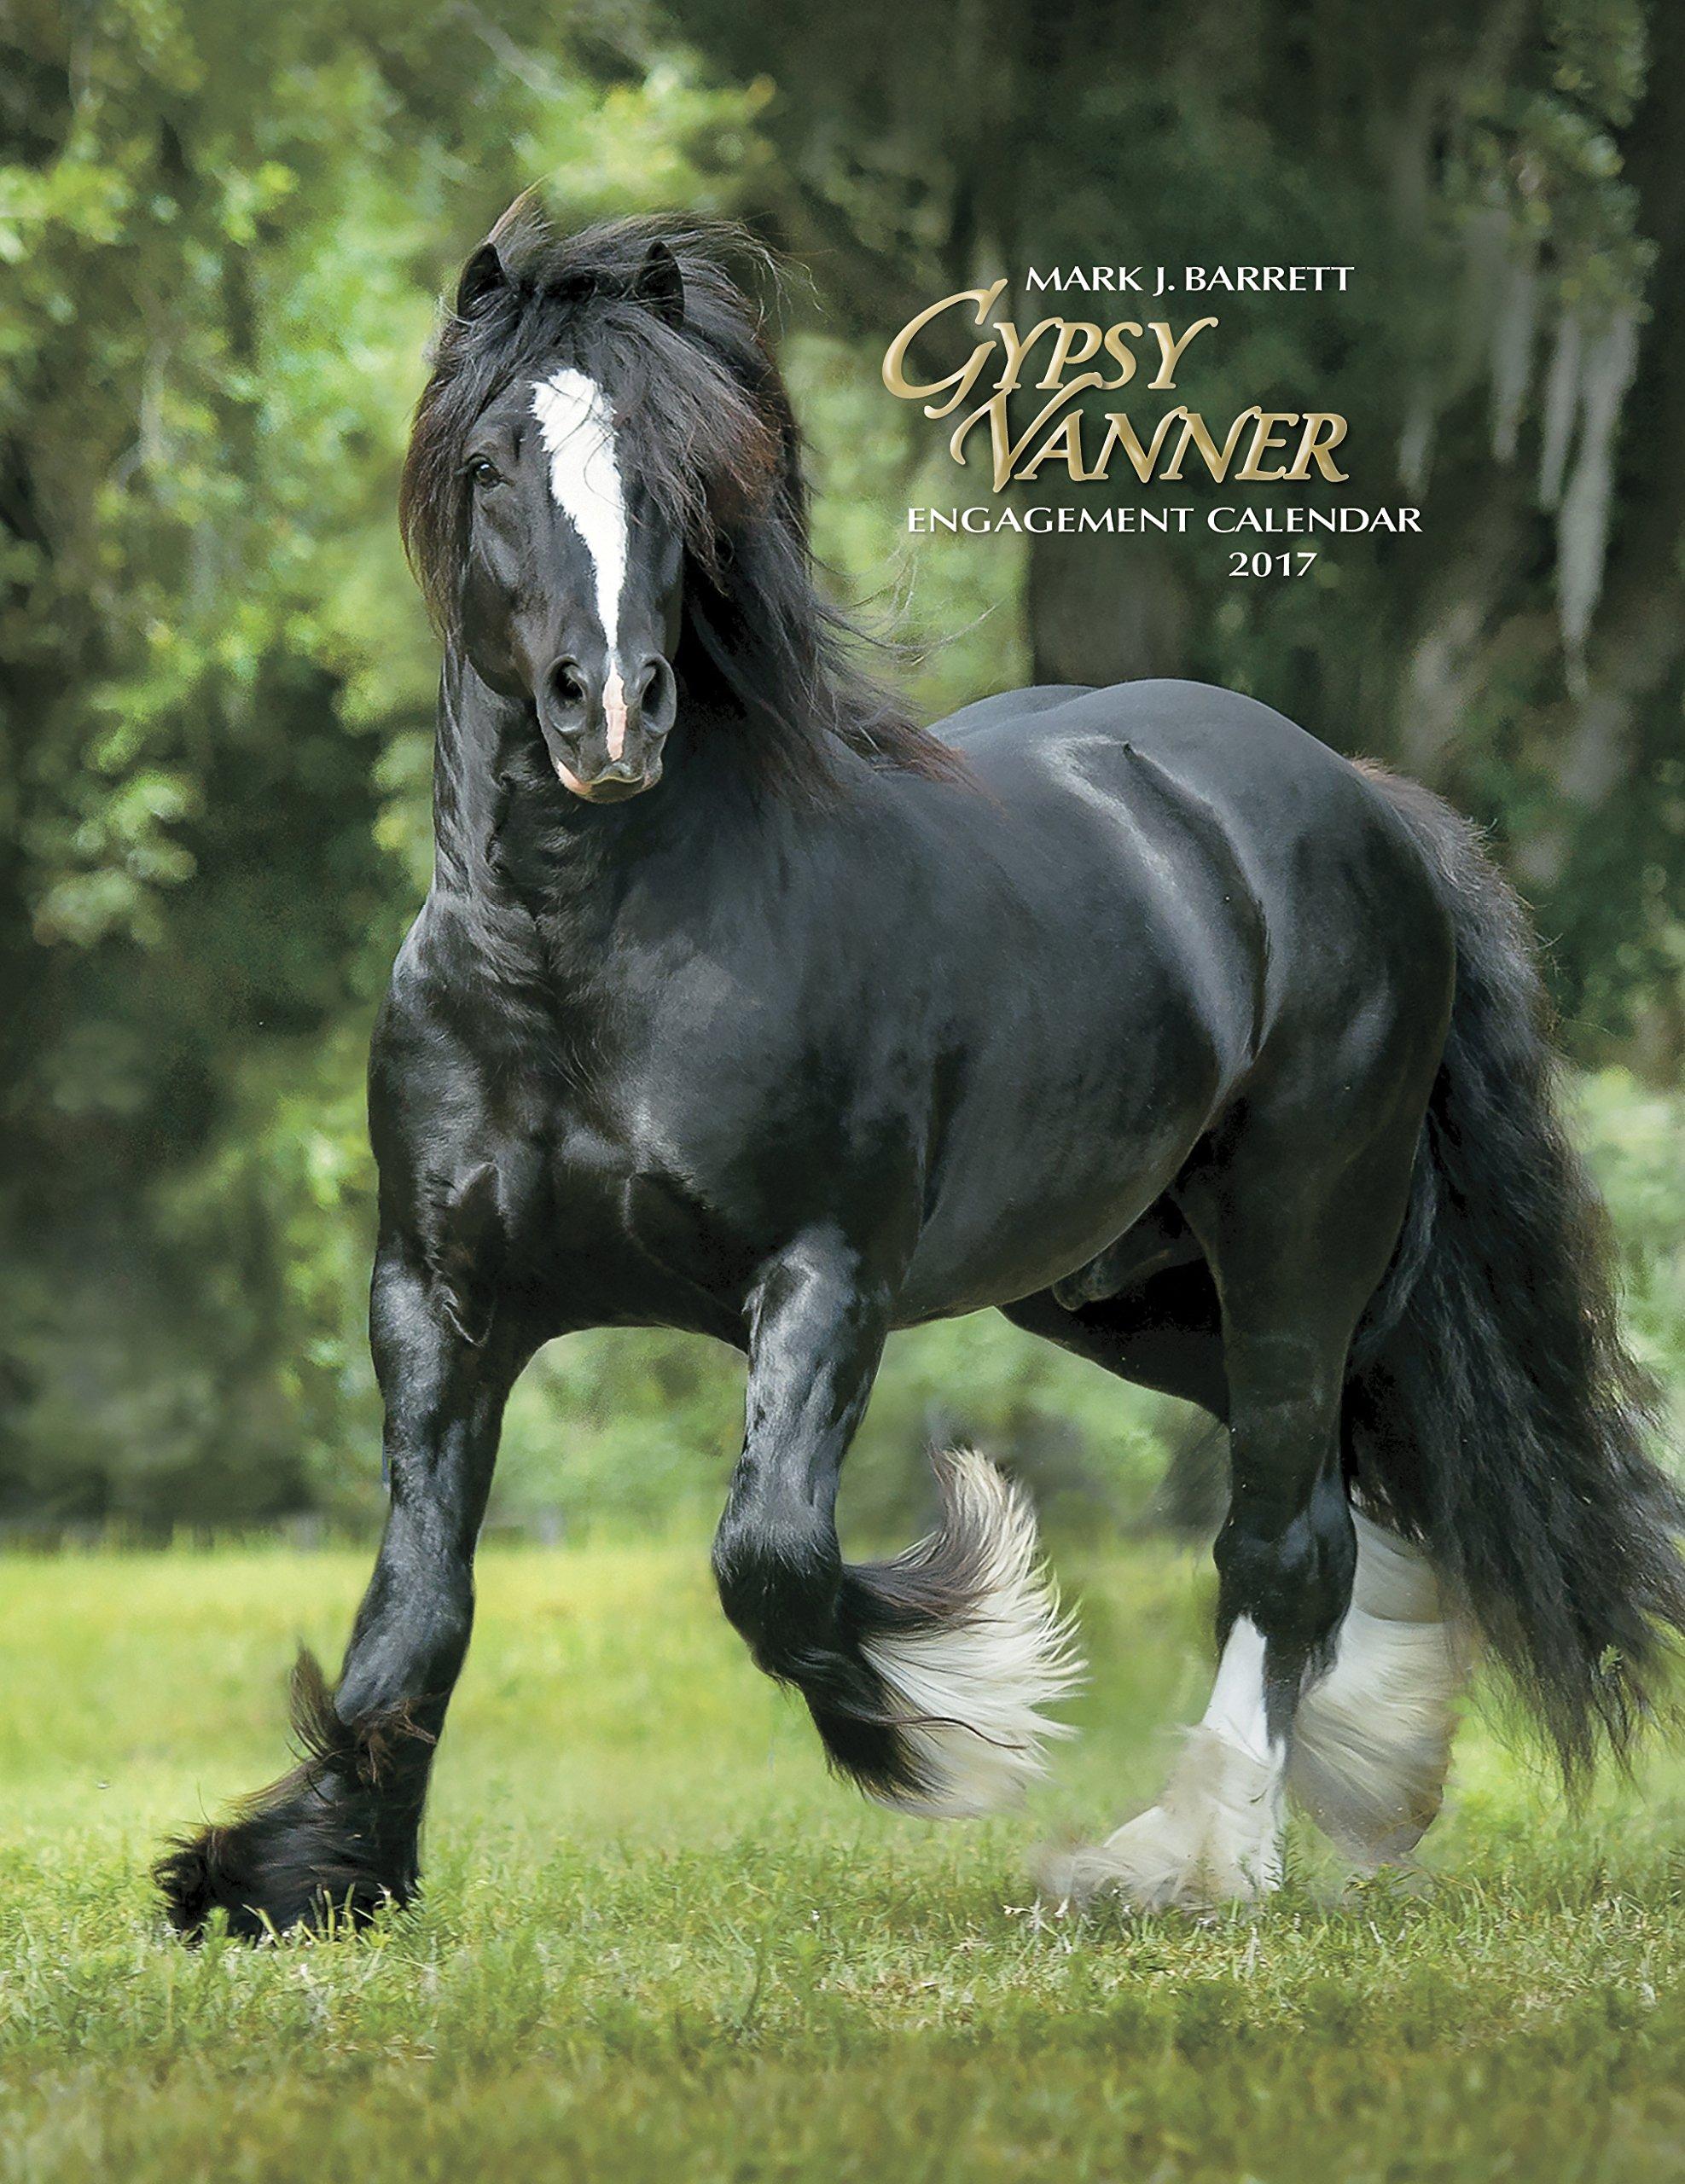 Gypsy Vanner Horse 2017 Engagement Calendar PDF